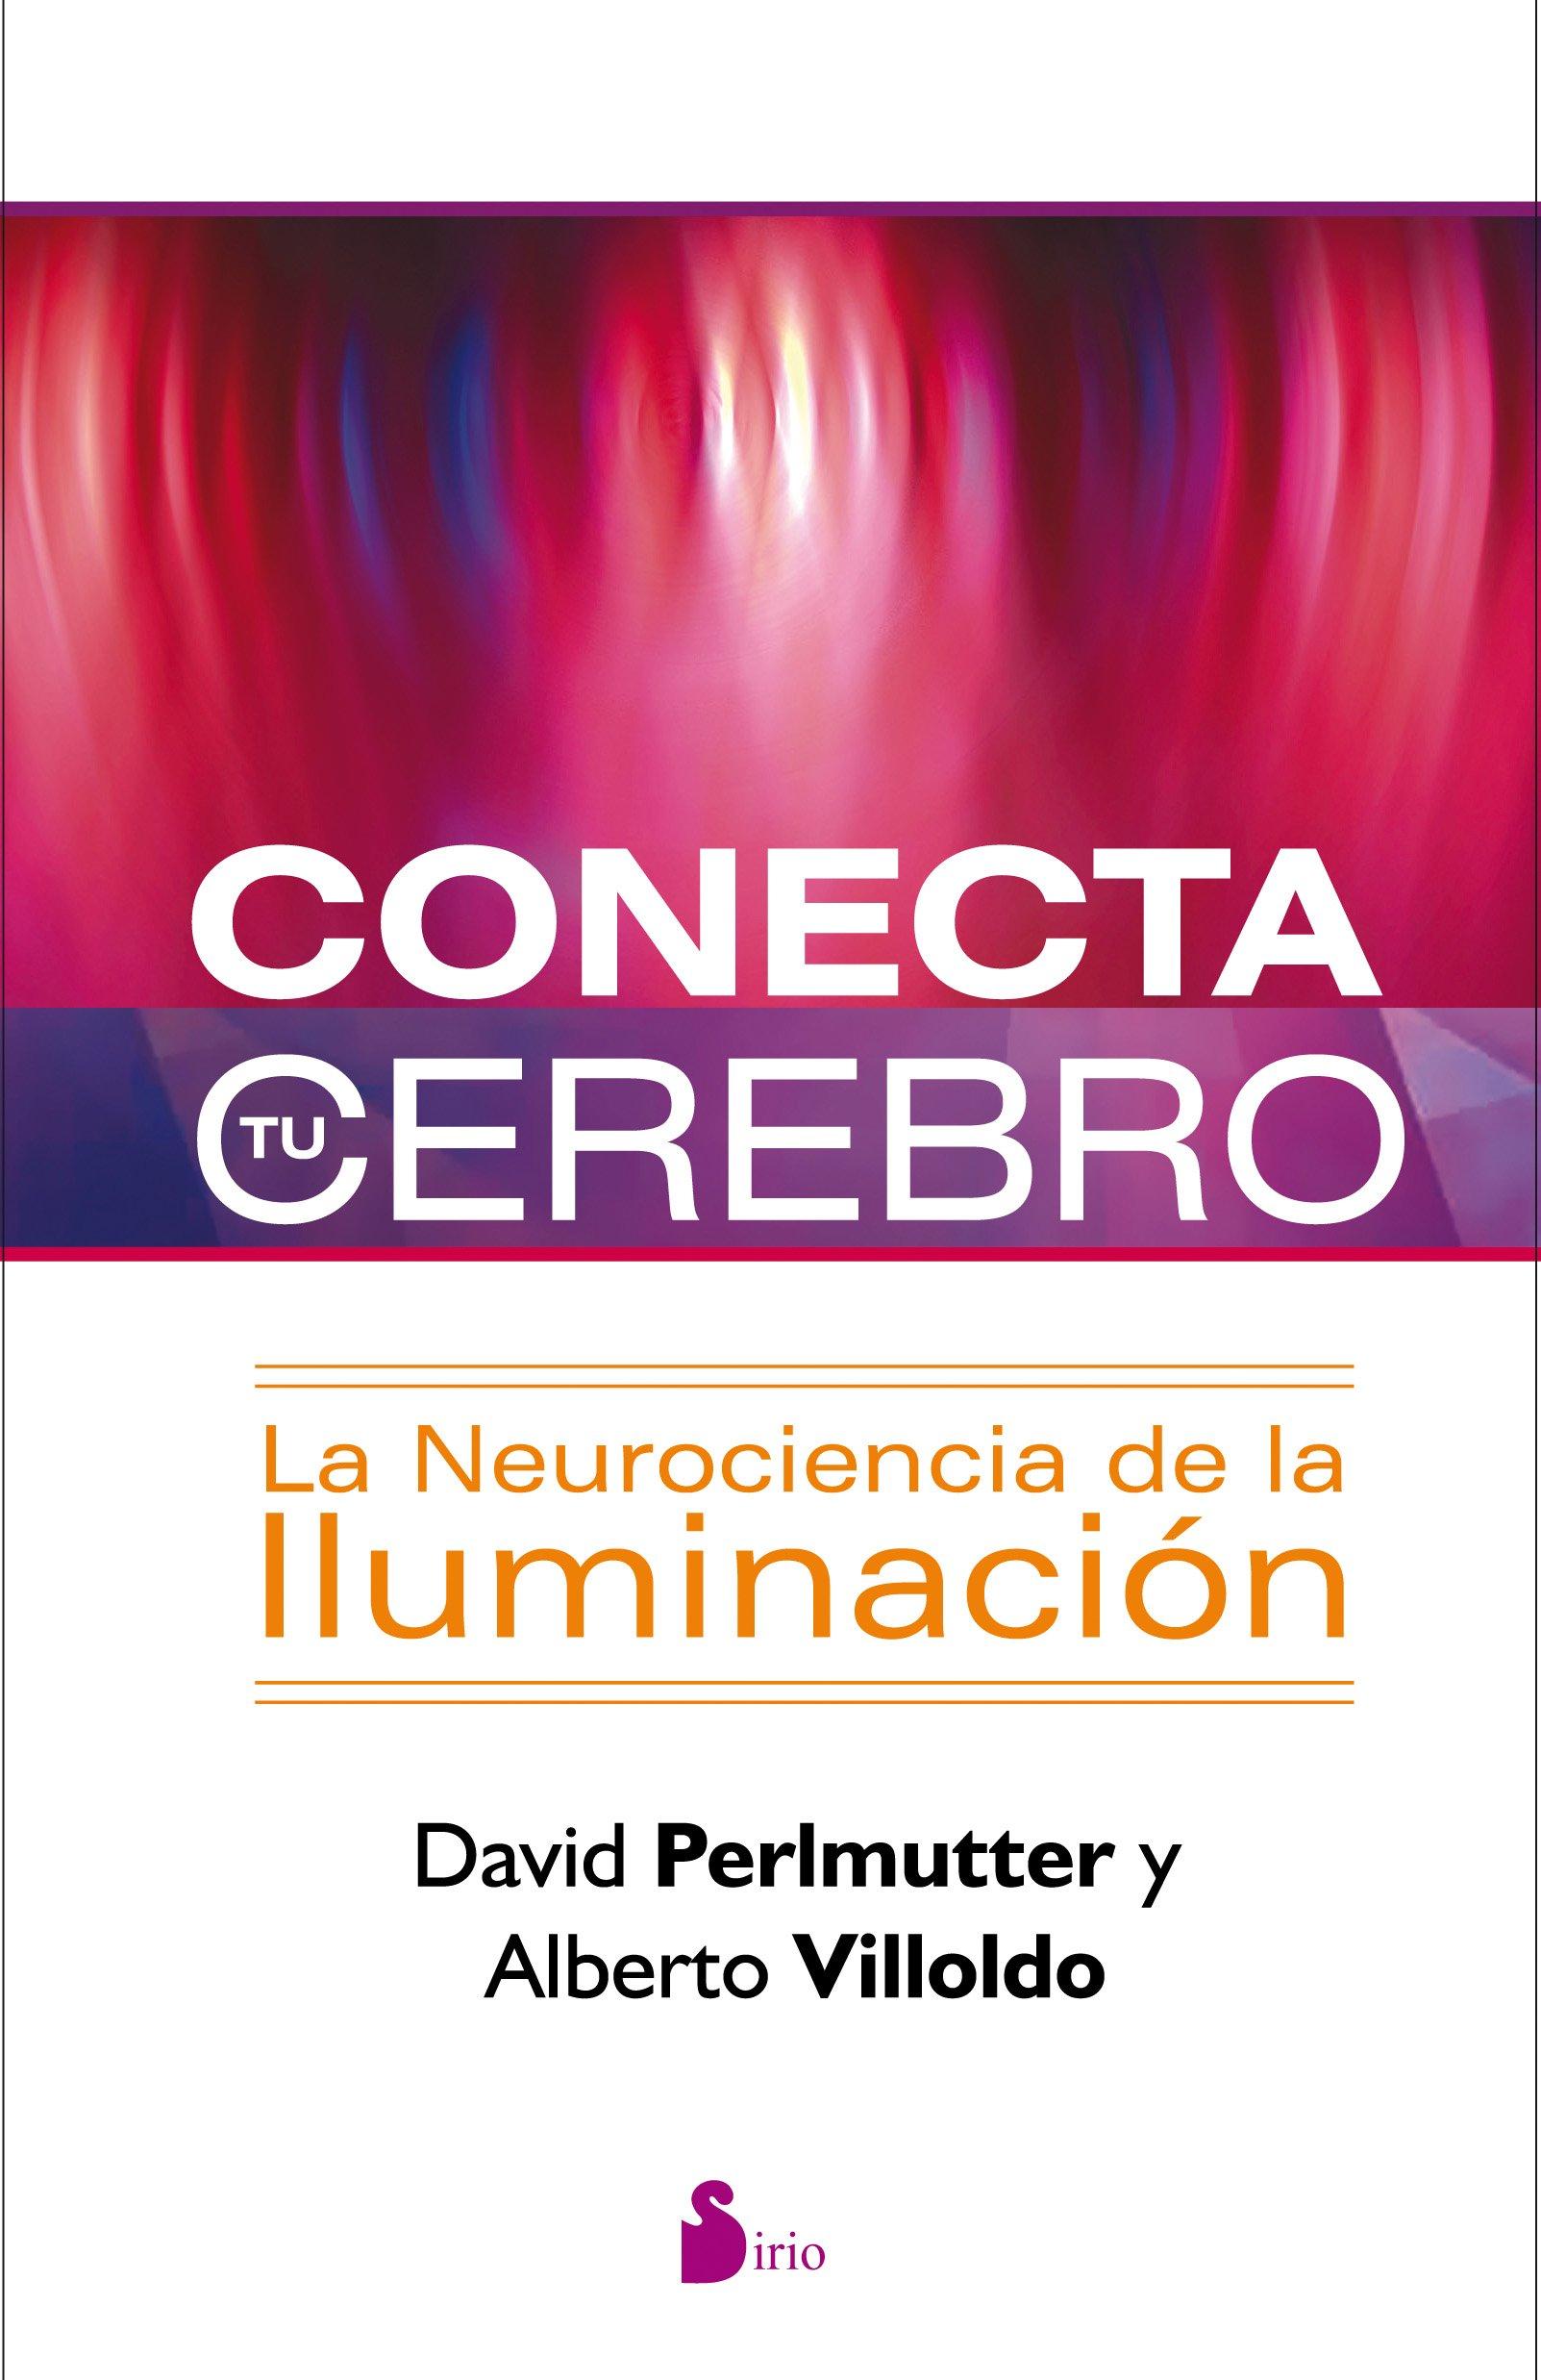 Conecta tu cerebro (Spanish Edition) ebook